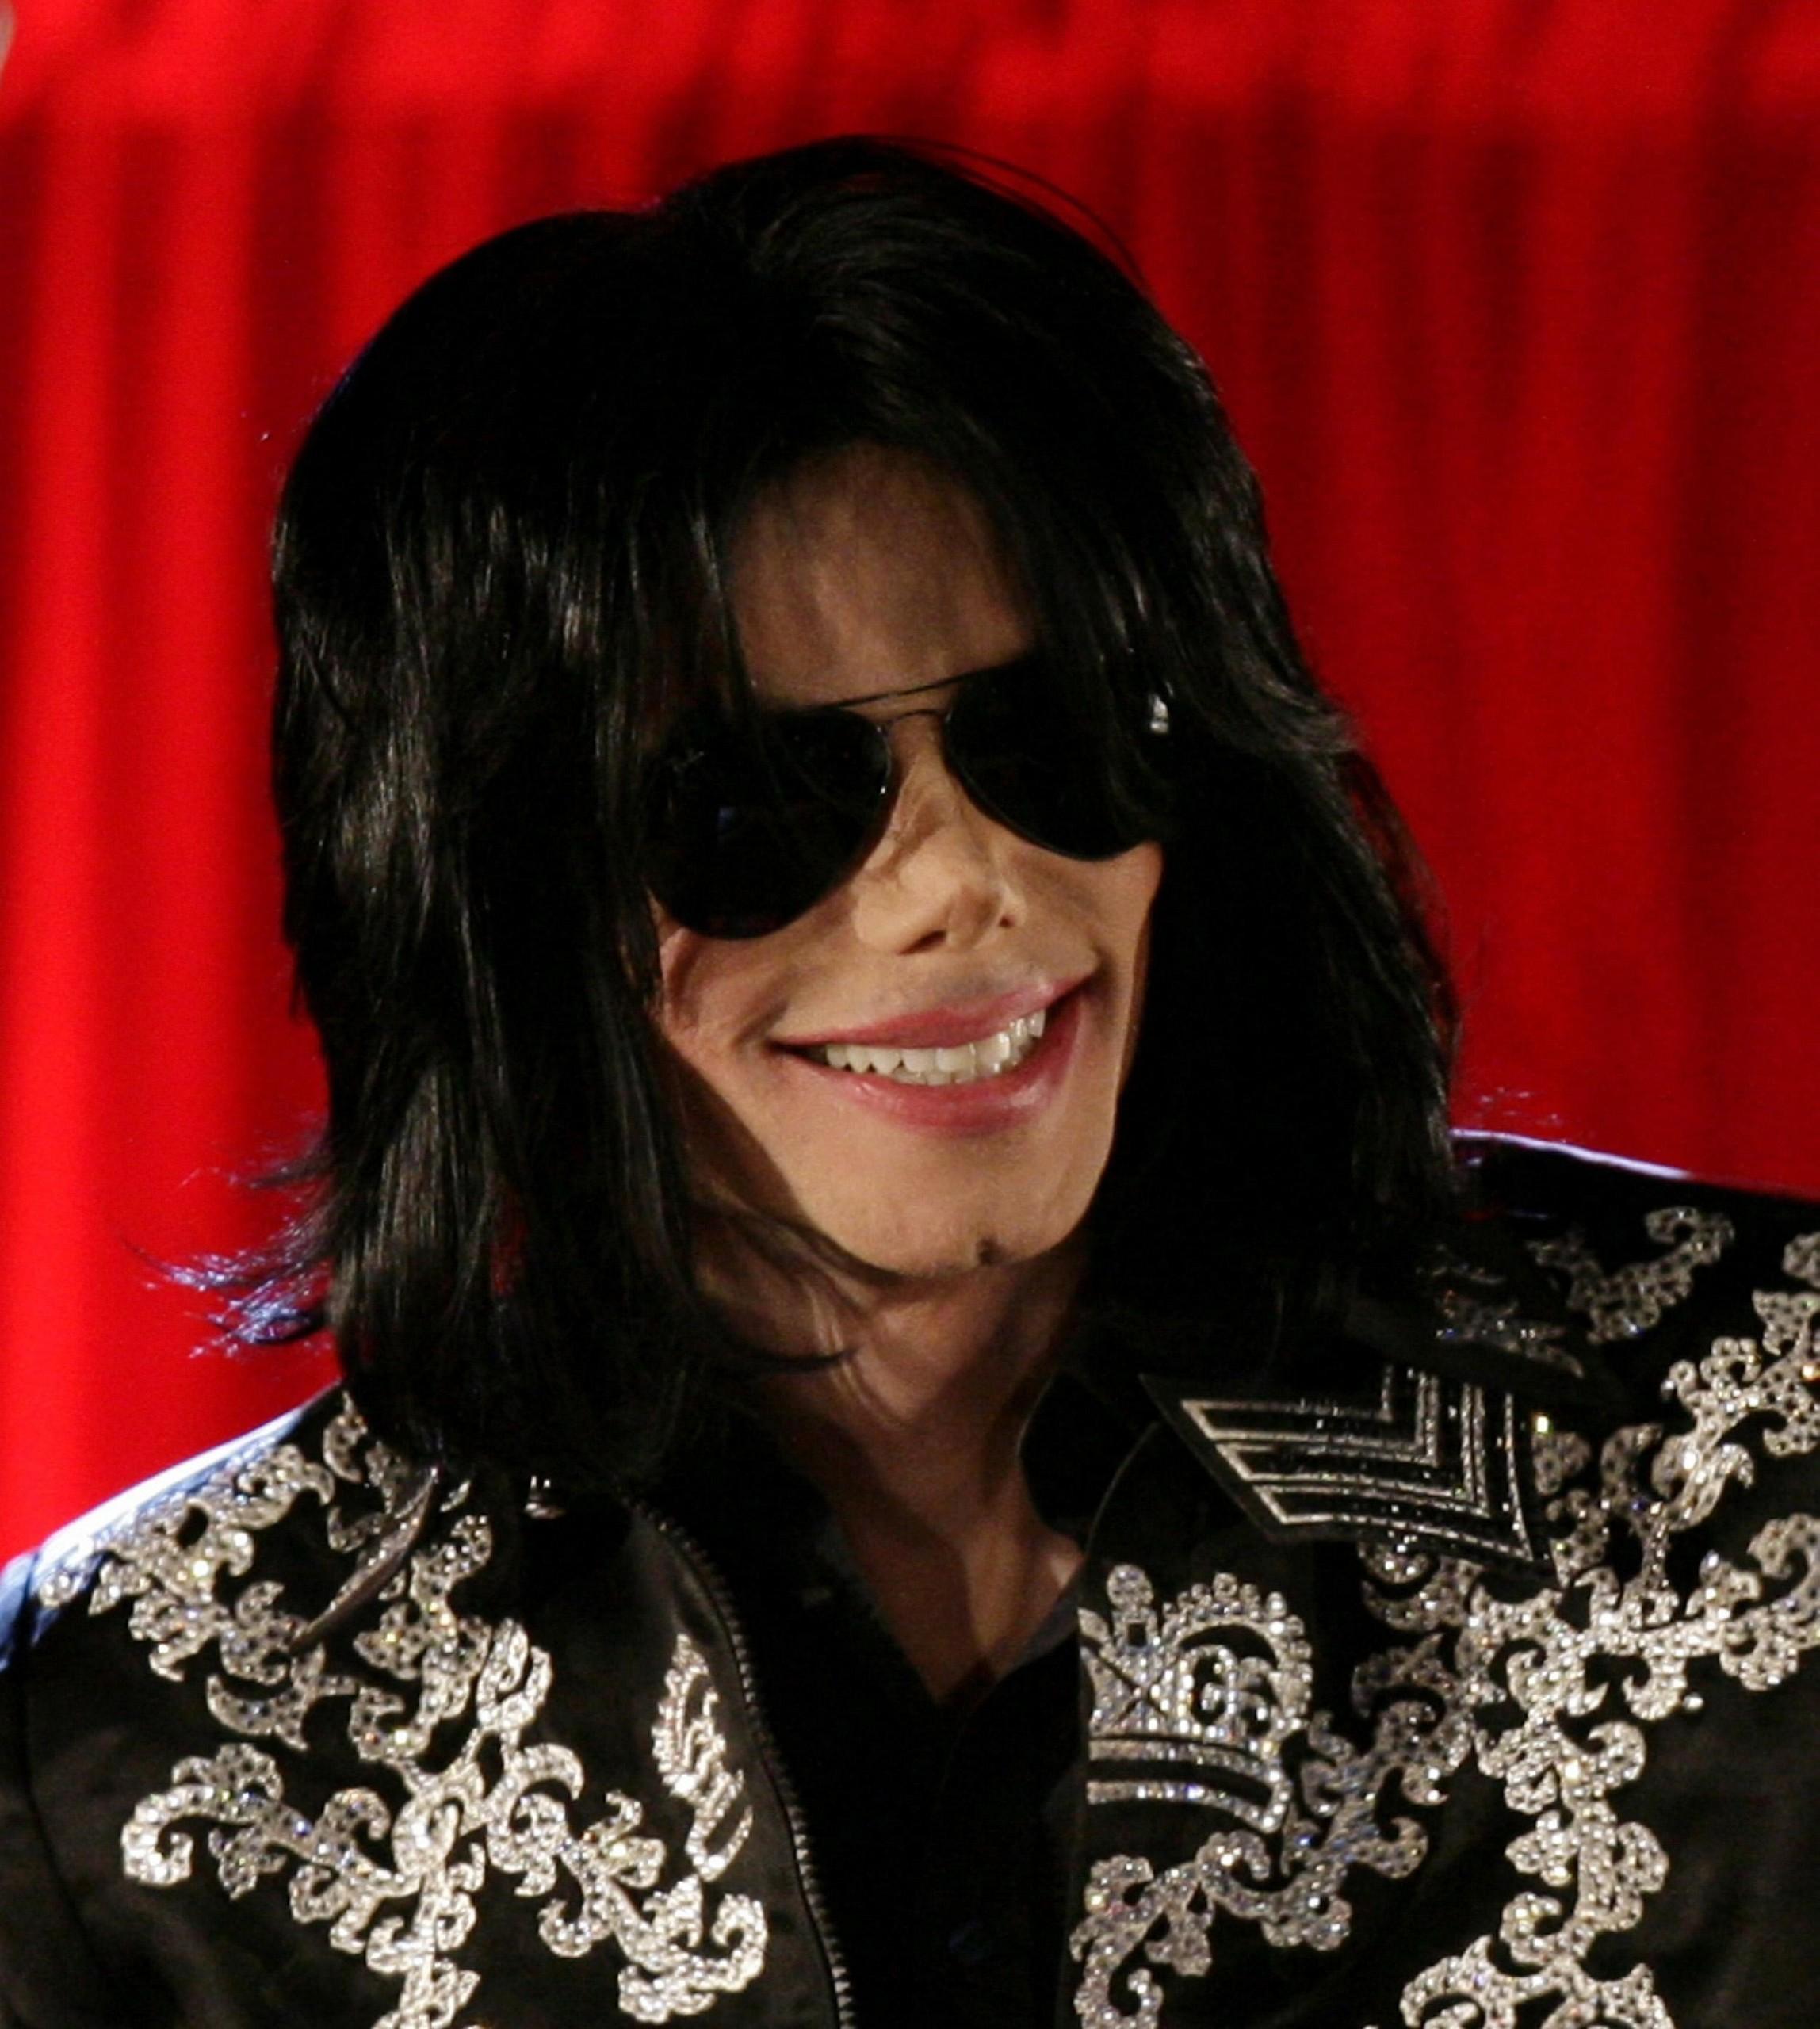 Michael Jackson's Sunglasses